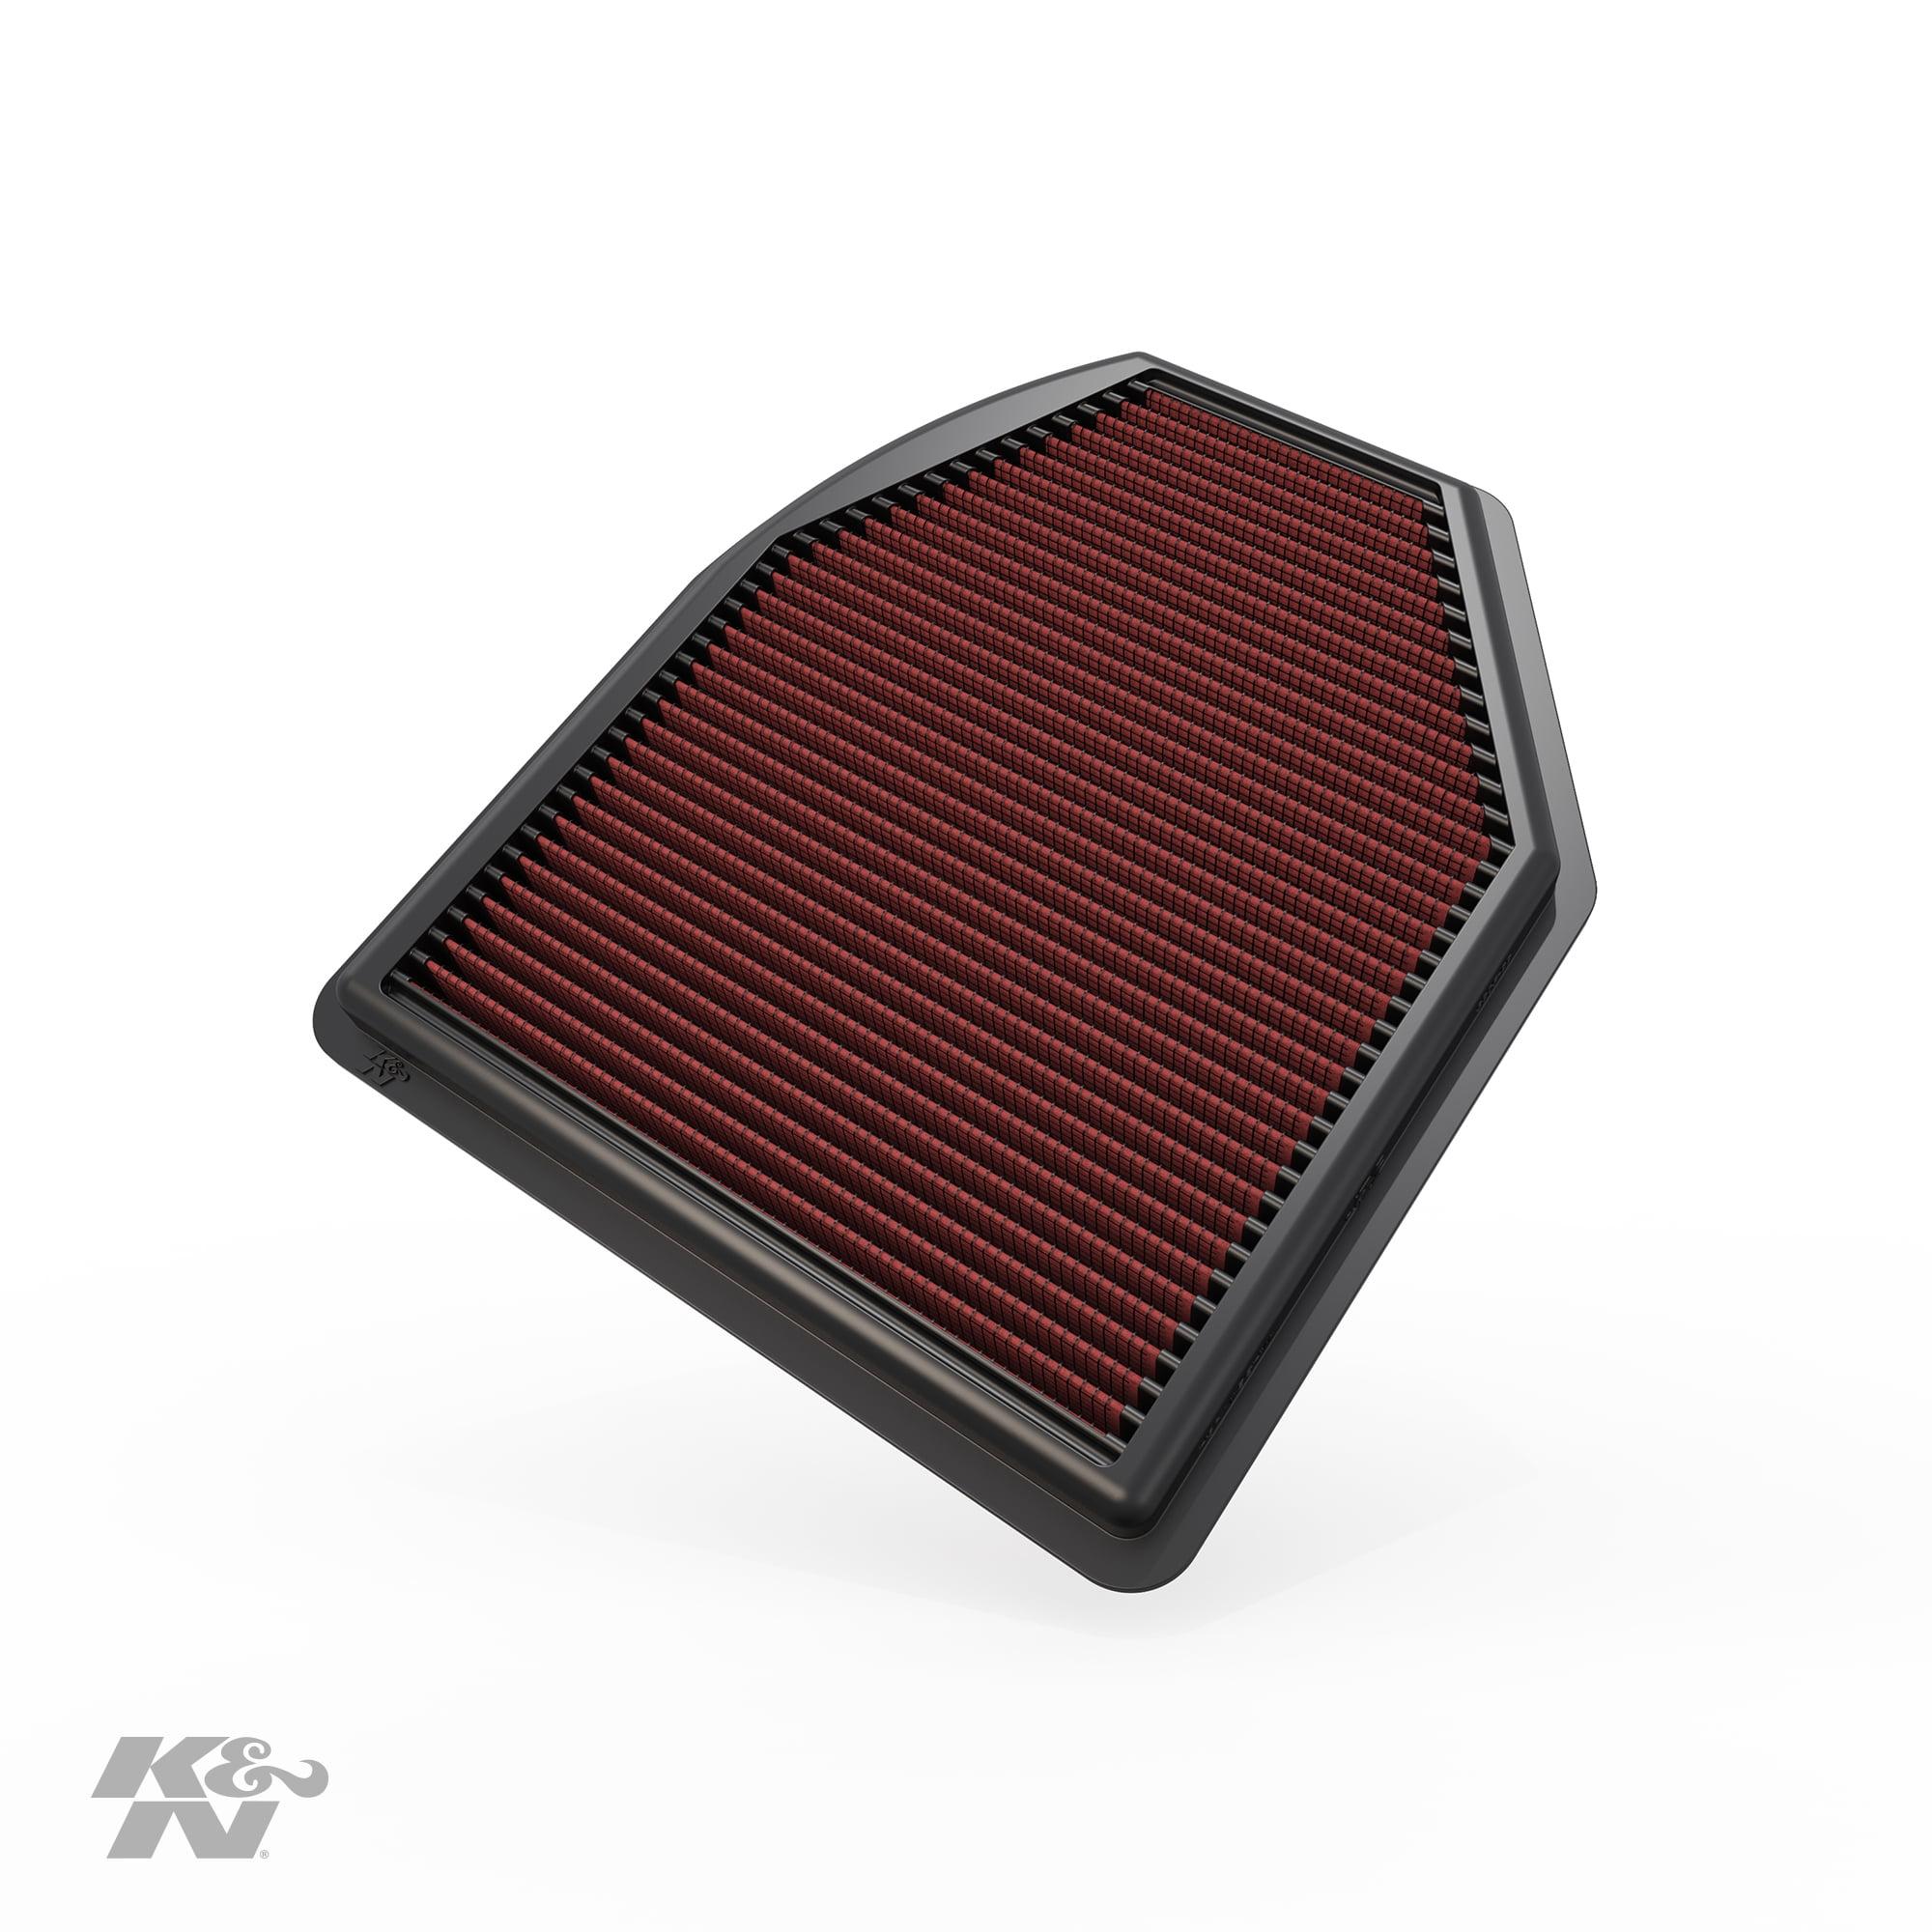 K&N Engine Air Filter: High Performance, Premium, Washable